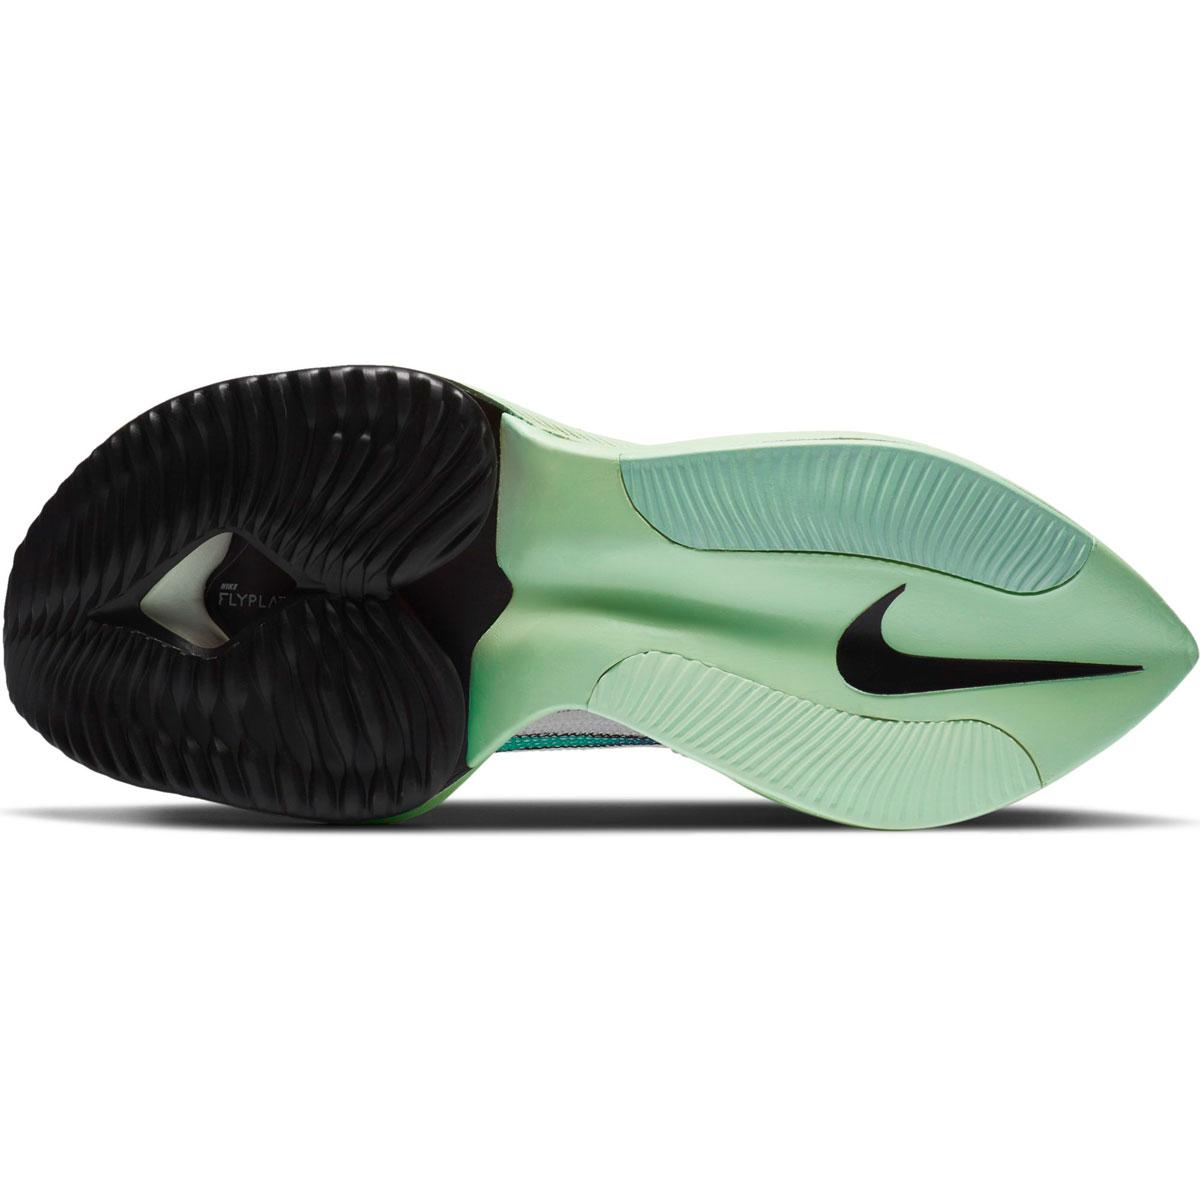 Women's Nike Air Zoom Alphafly Next% Running Shoe - Color: White/Flash Crimson/Jade Aura - Size: 5 - Width: Regular, White/Flash Crimson/Jade Aura, large, image 4